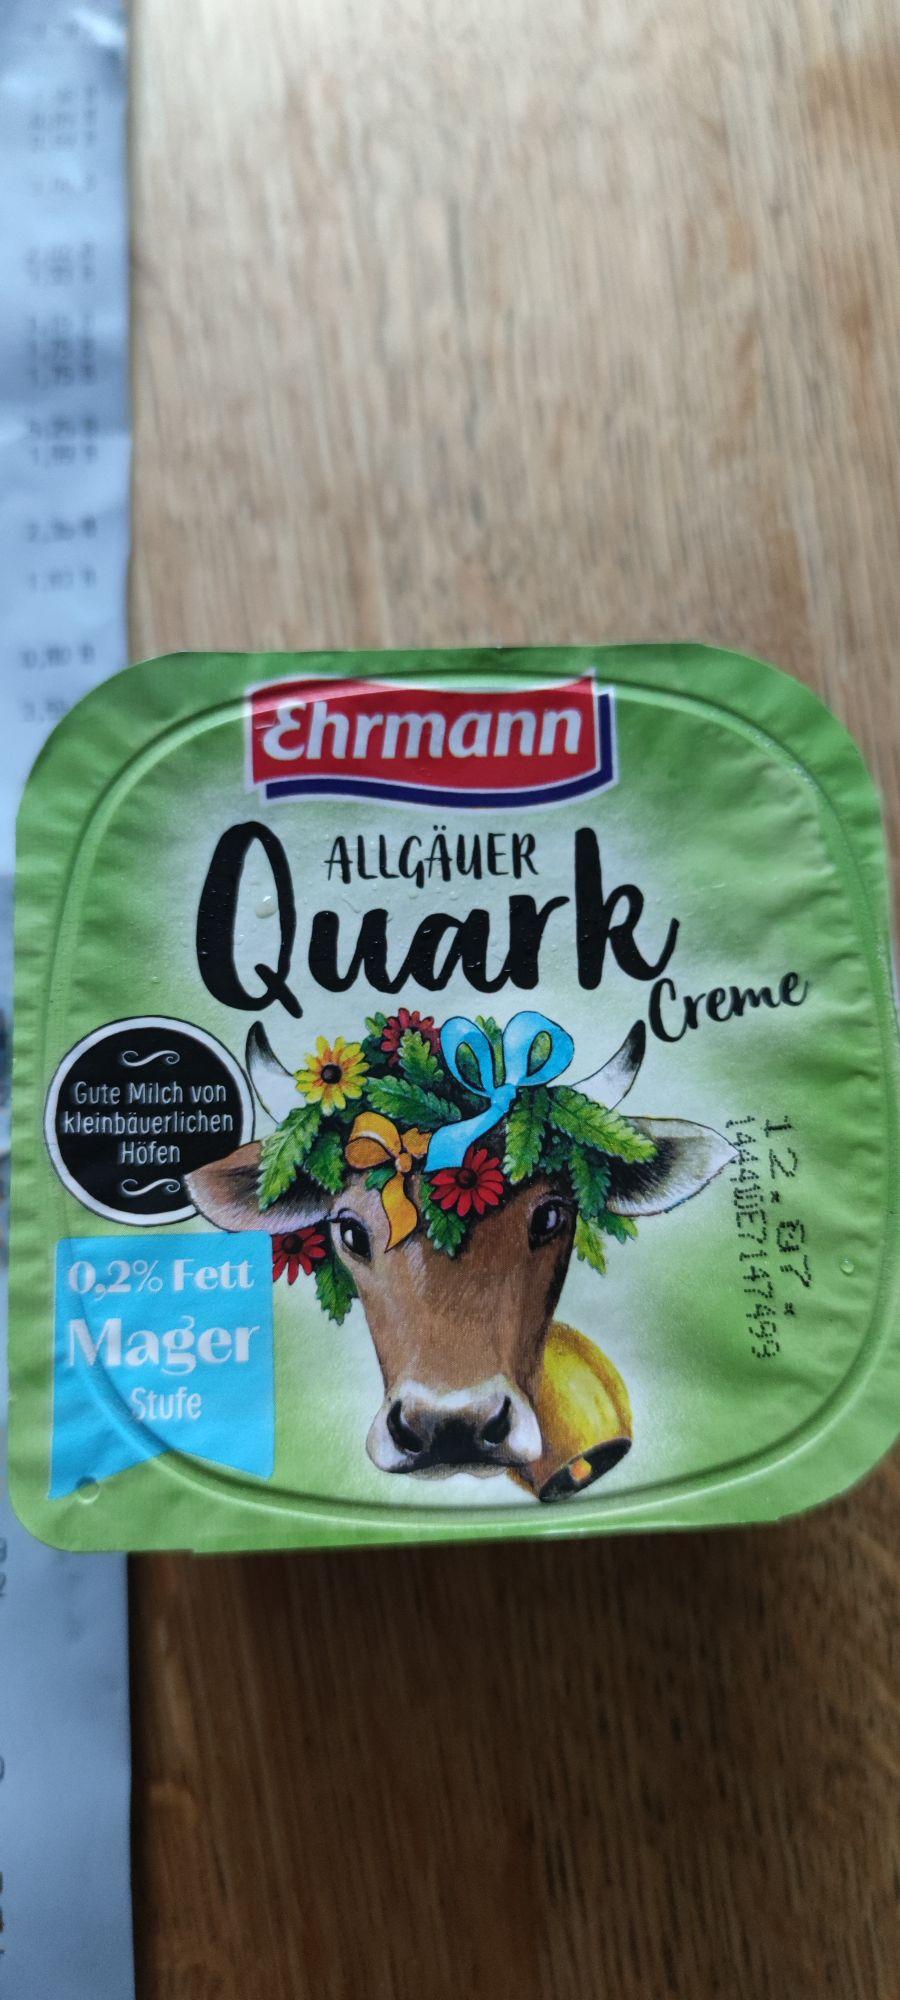 Lokal - Kaufland Wust Brandenburg - Ehrmann Allgäuer Quark 0,2 % Fett Mager Gratis durch MHD & Coupon